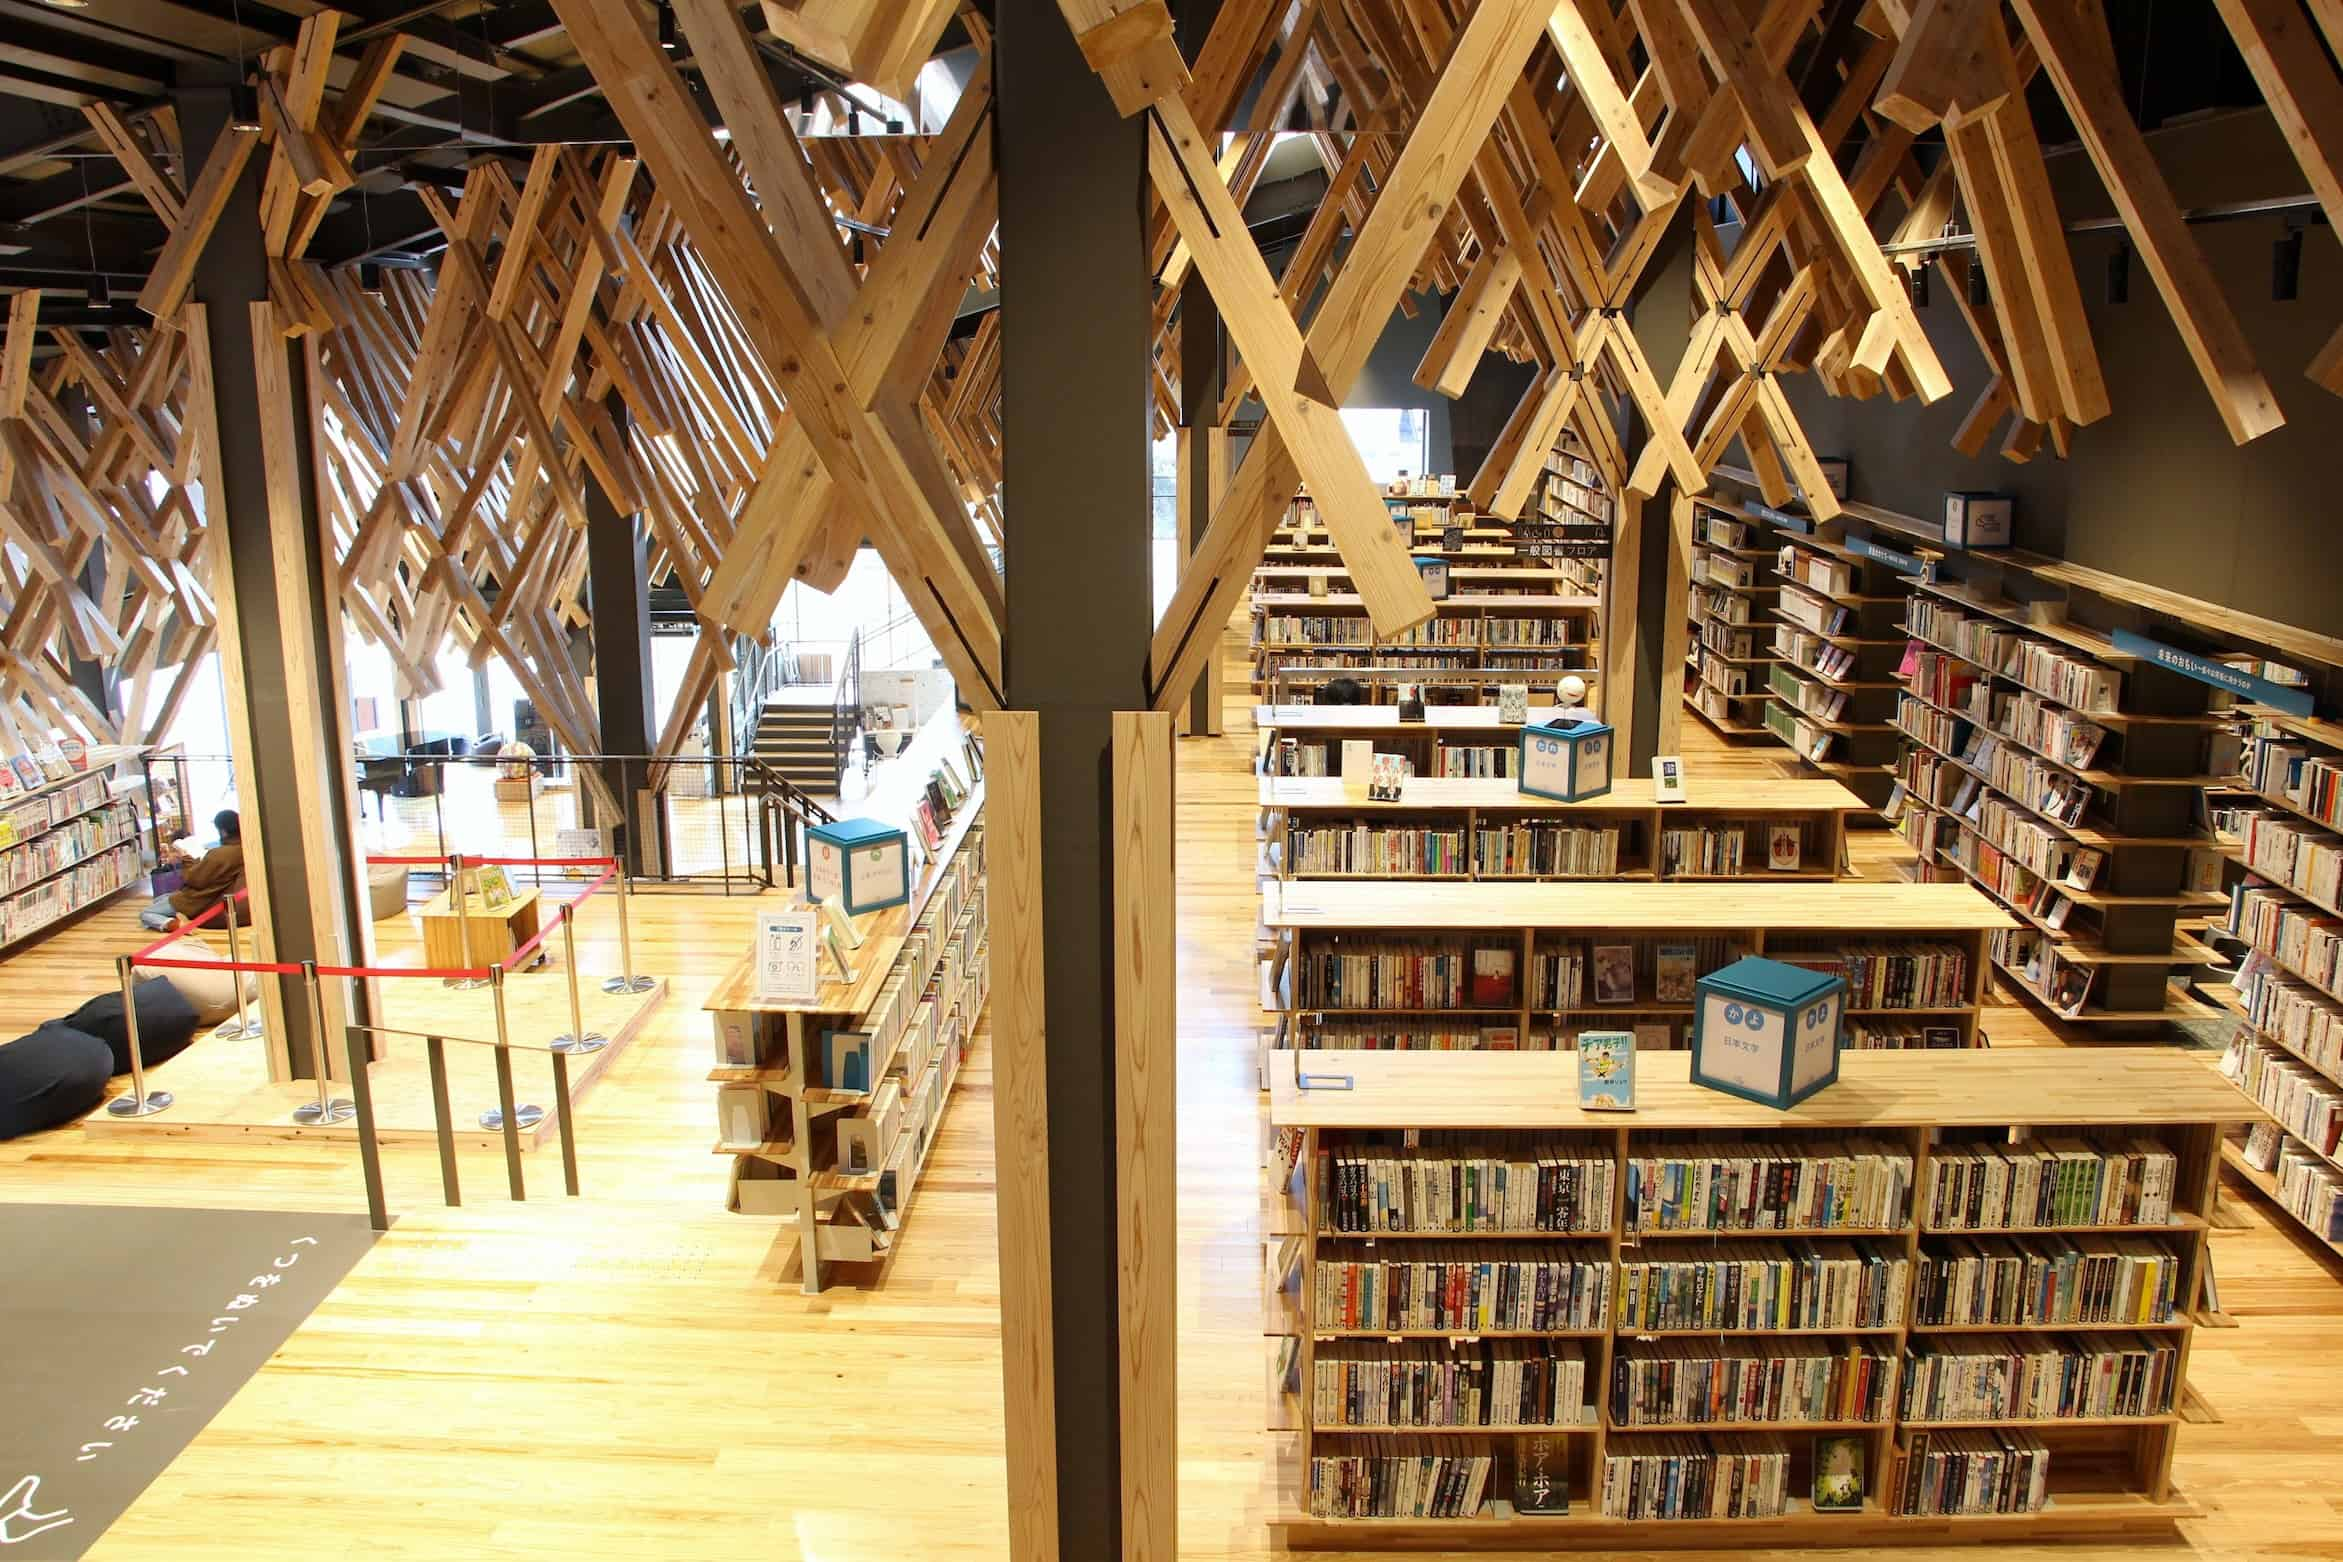 Yusuhara Kumo no Ue Community Library design by Kengo Kuma